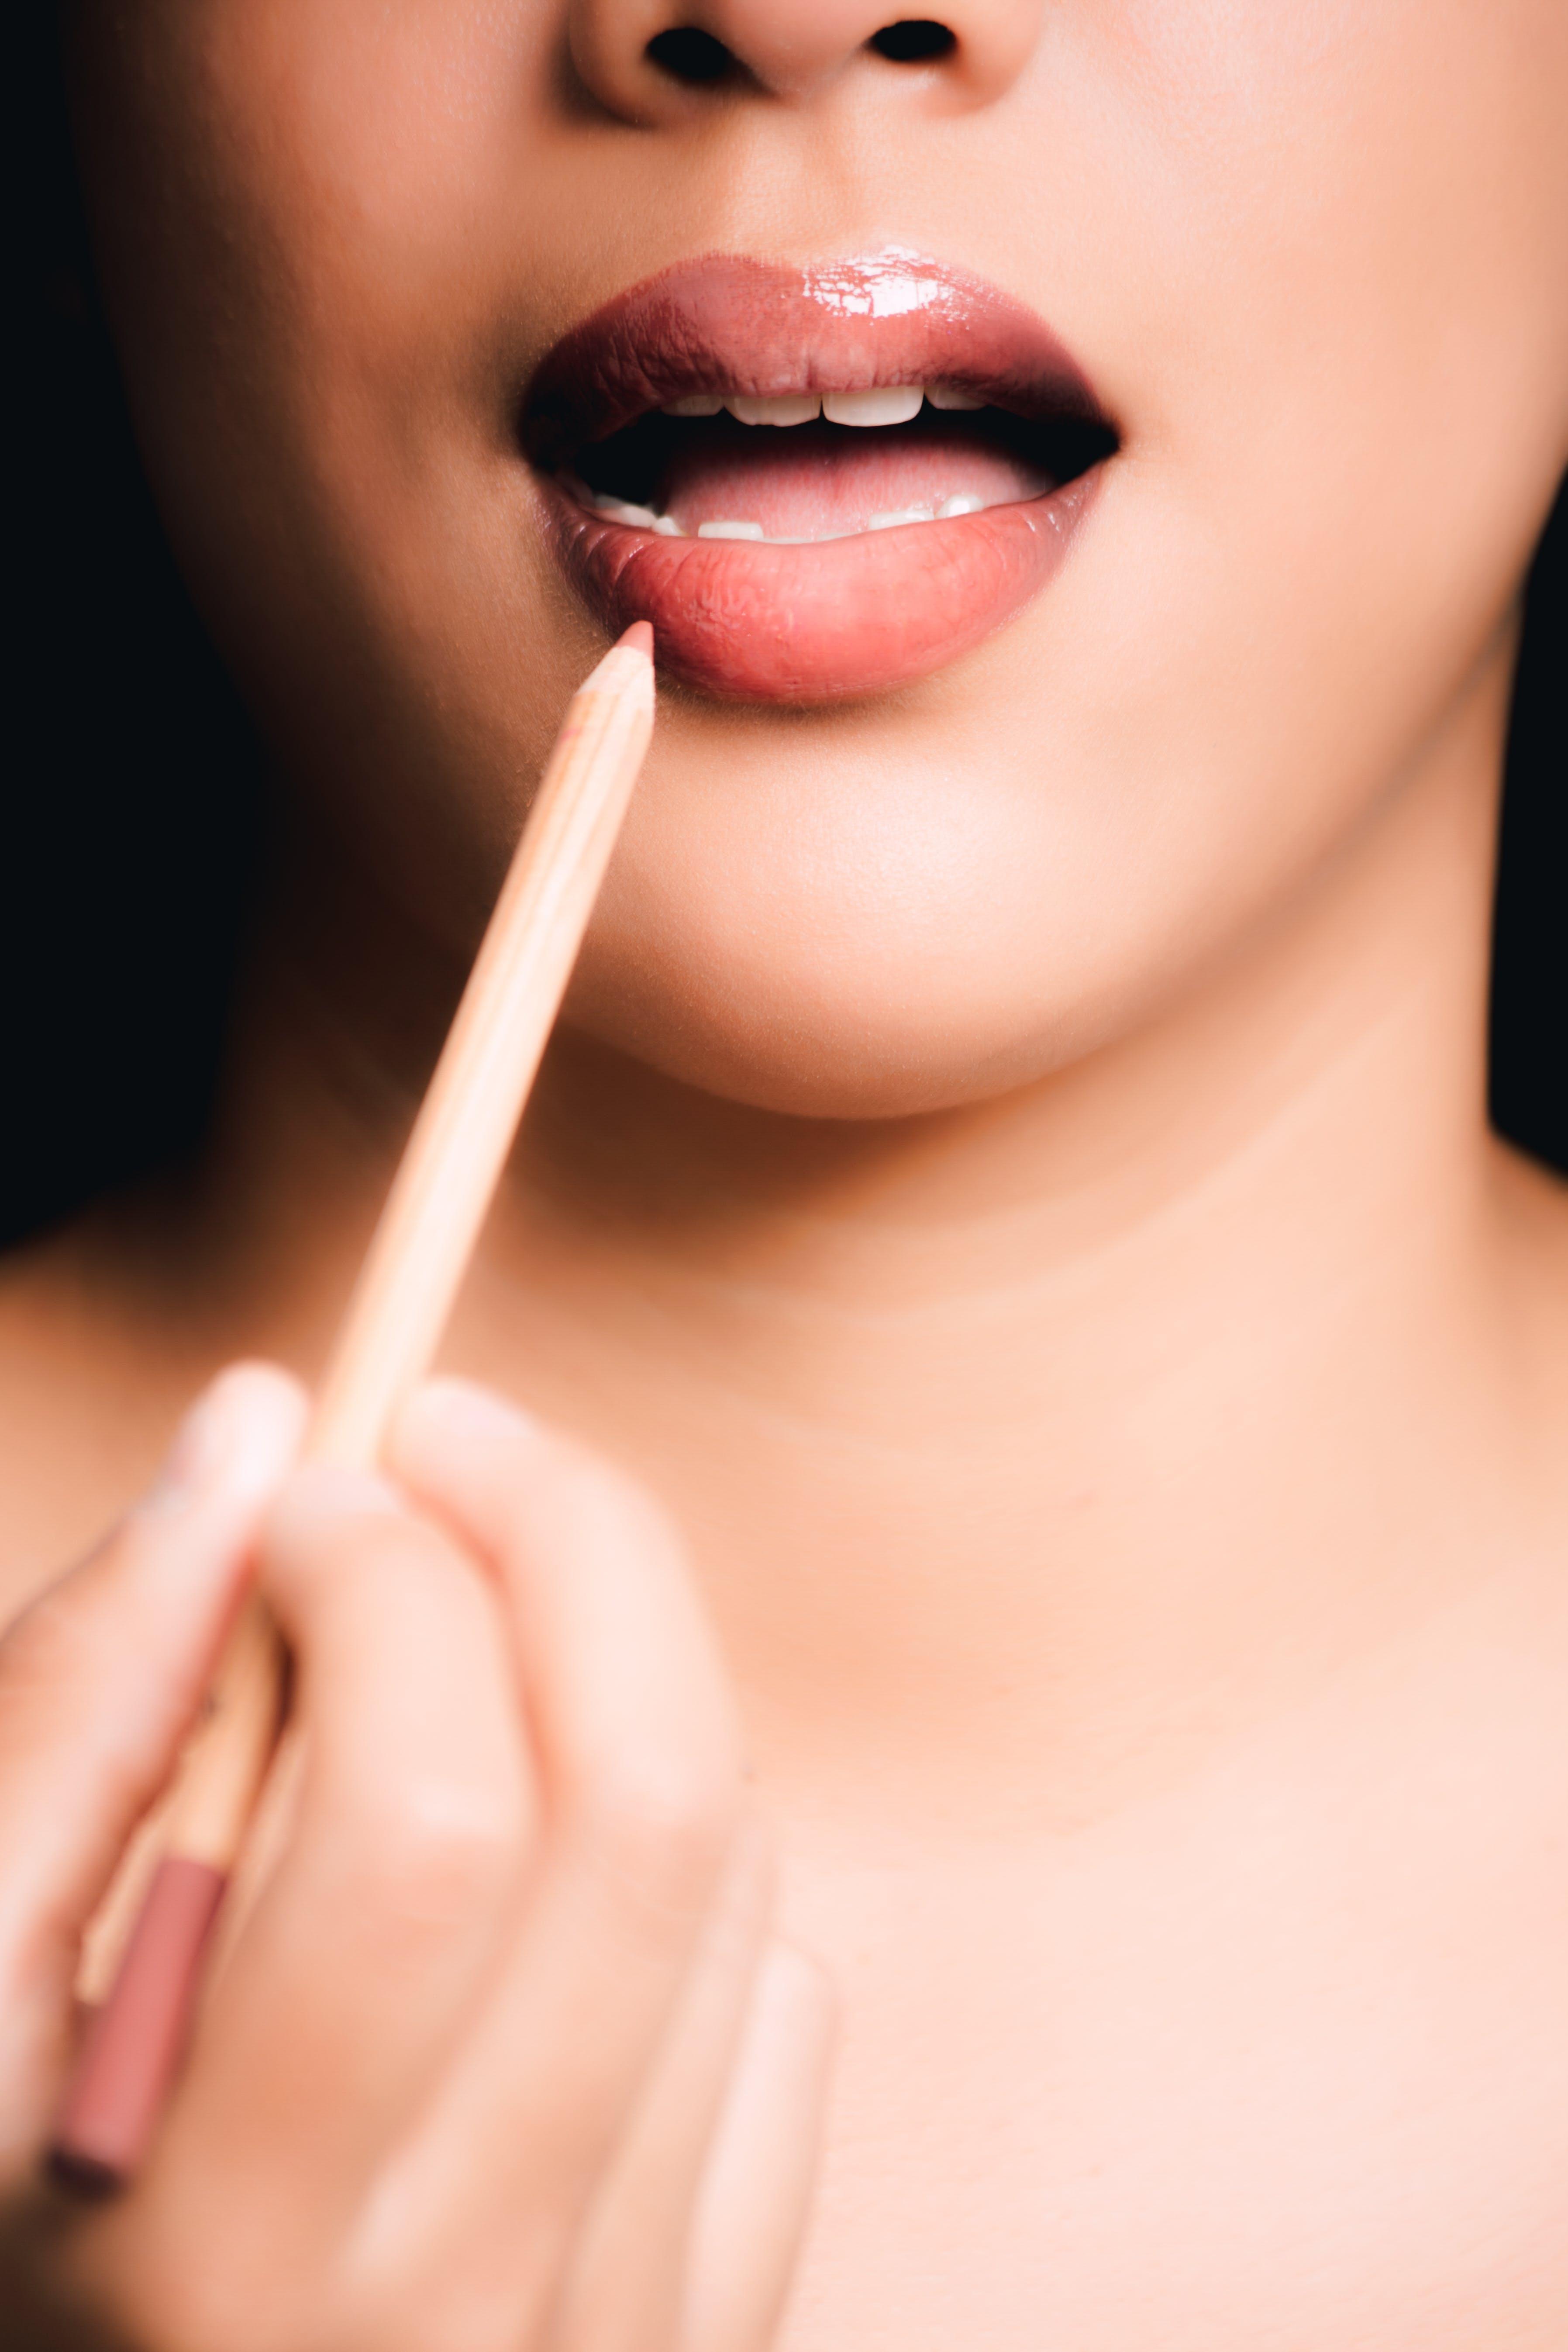 Woman Lipstick Pencil